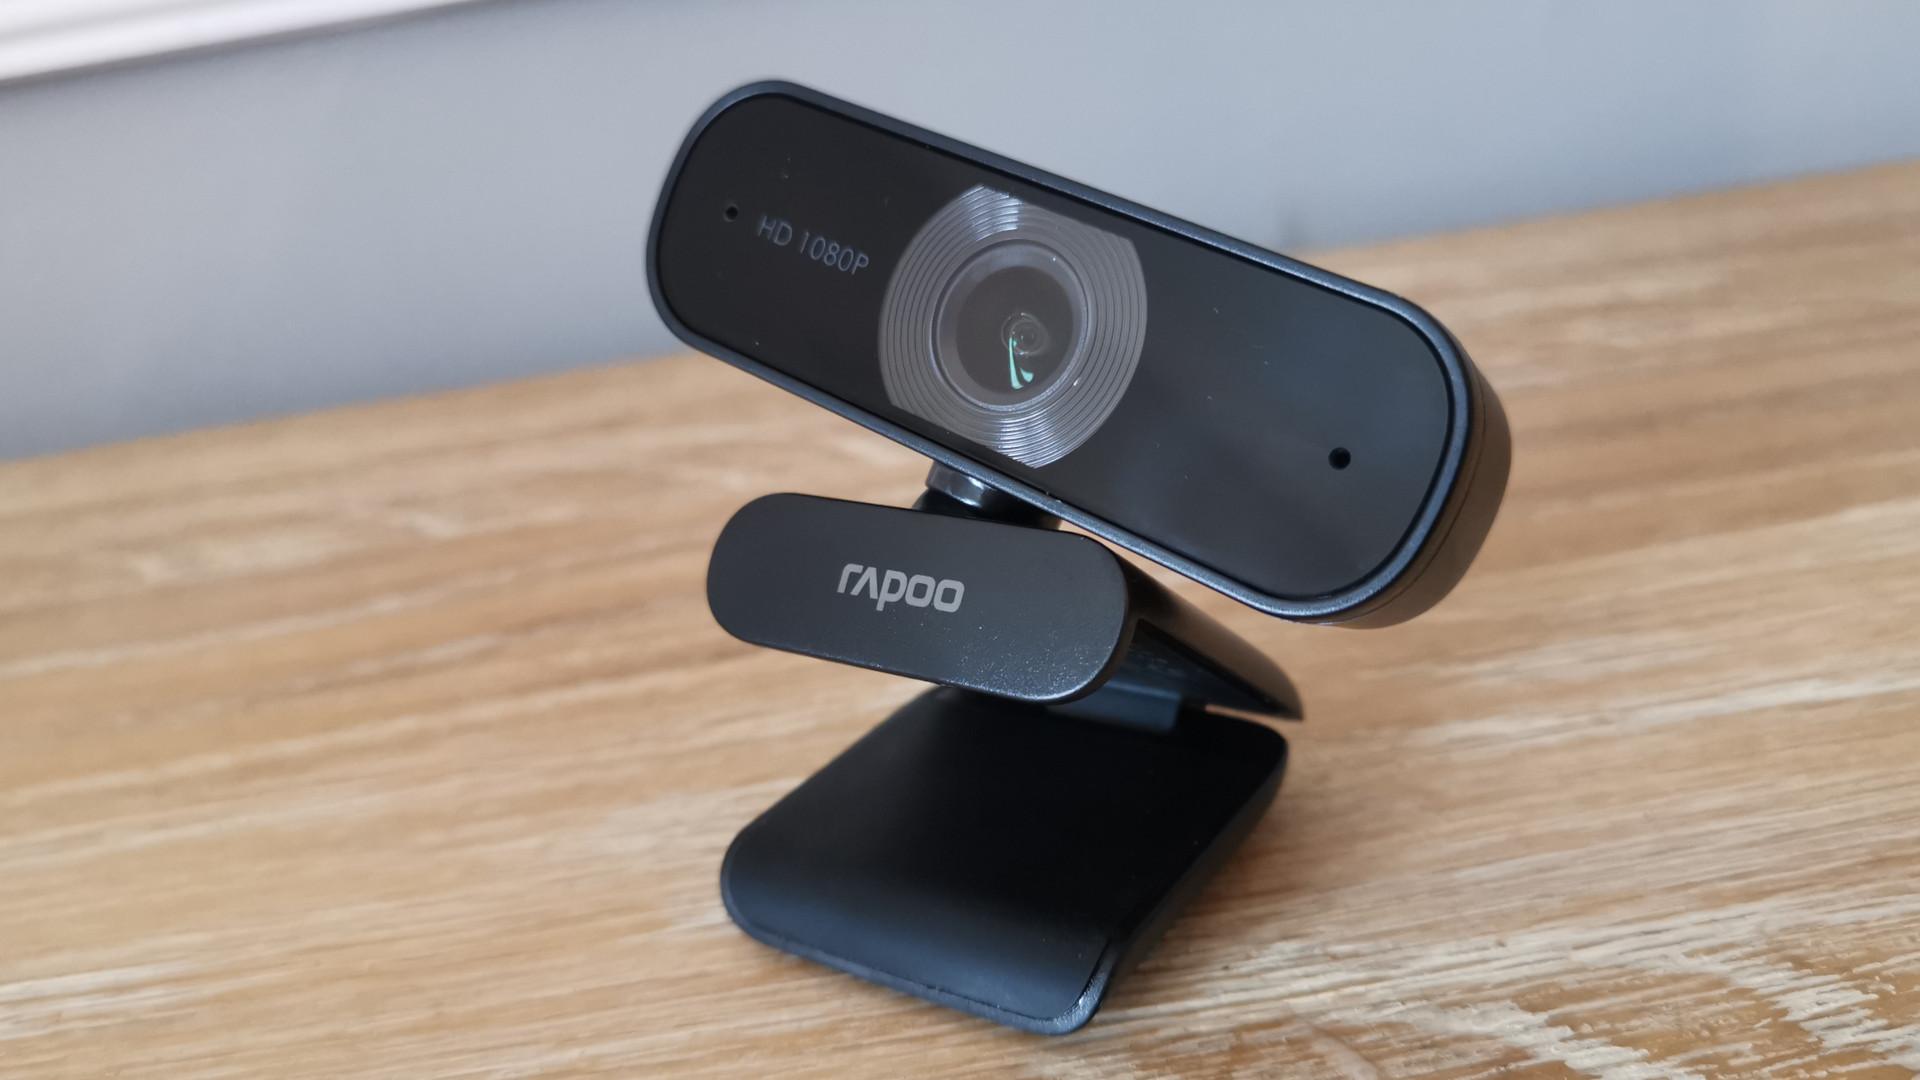 The Rapoo XW180 webcam on a table